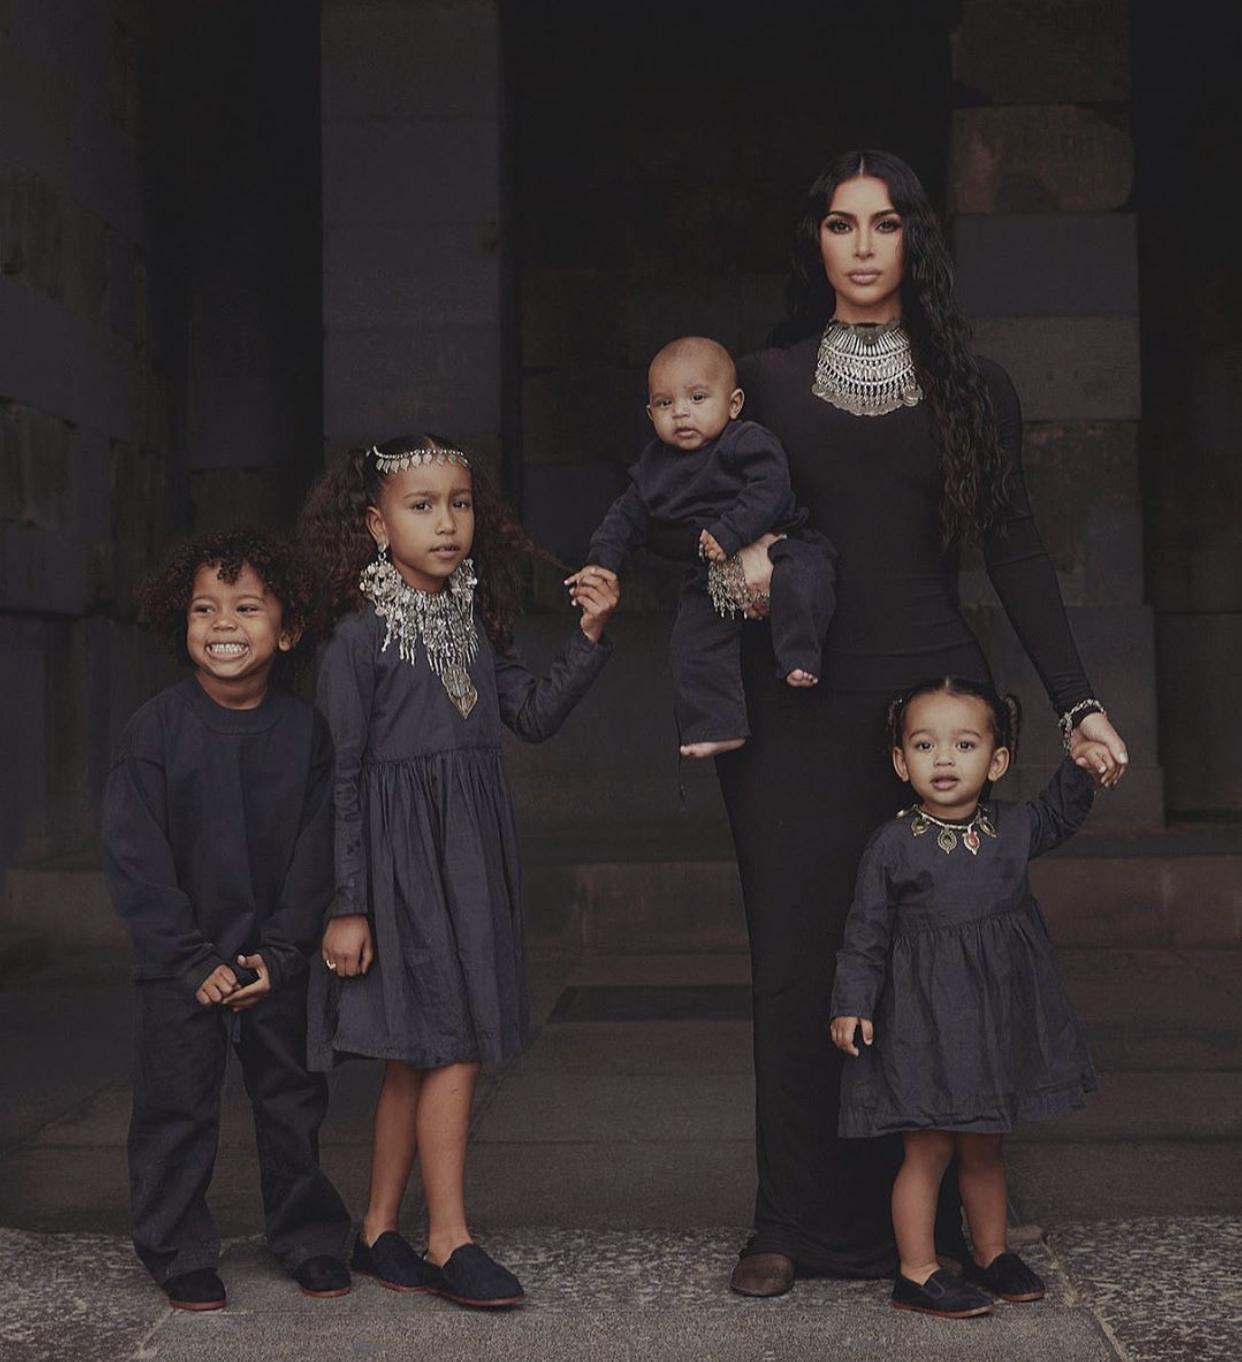 Kim Kardashian & Her Four Children Wear All Black, While ...